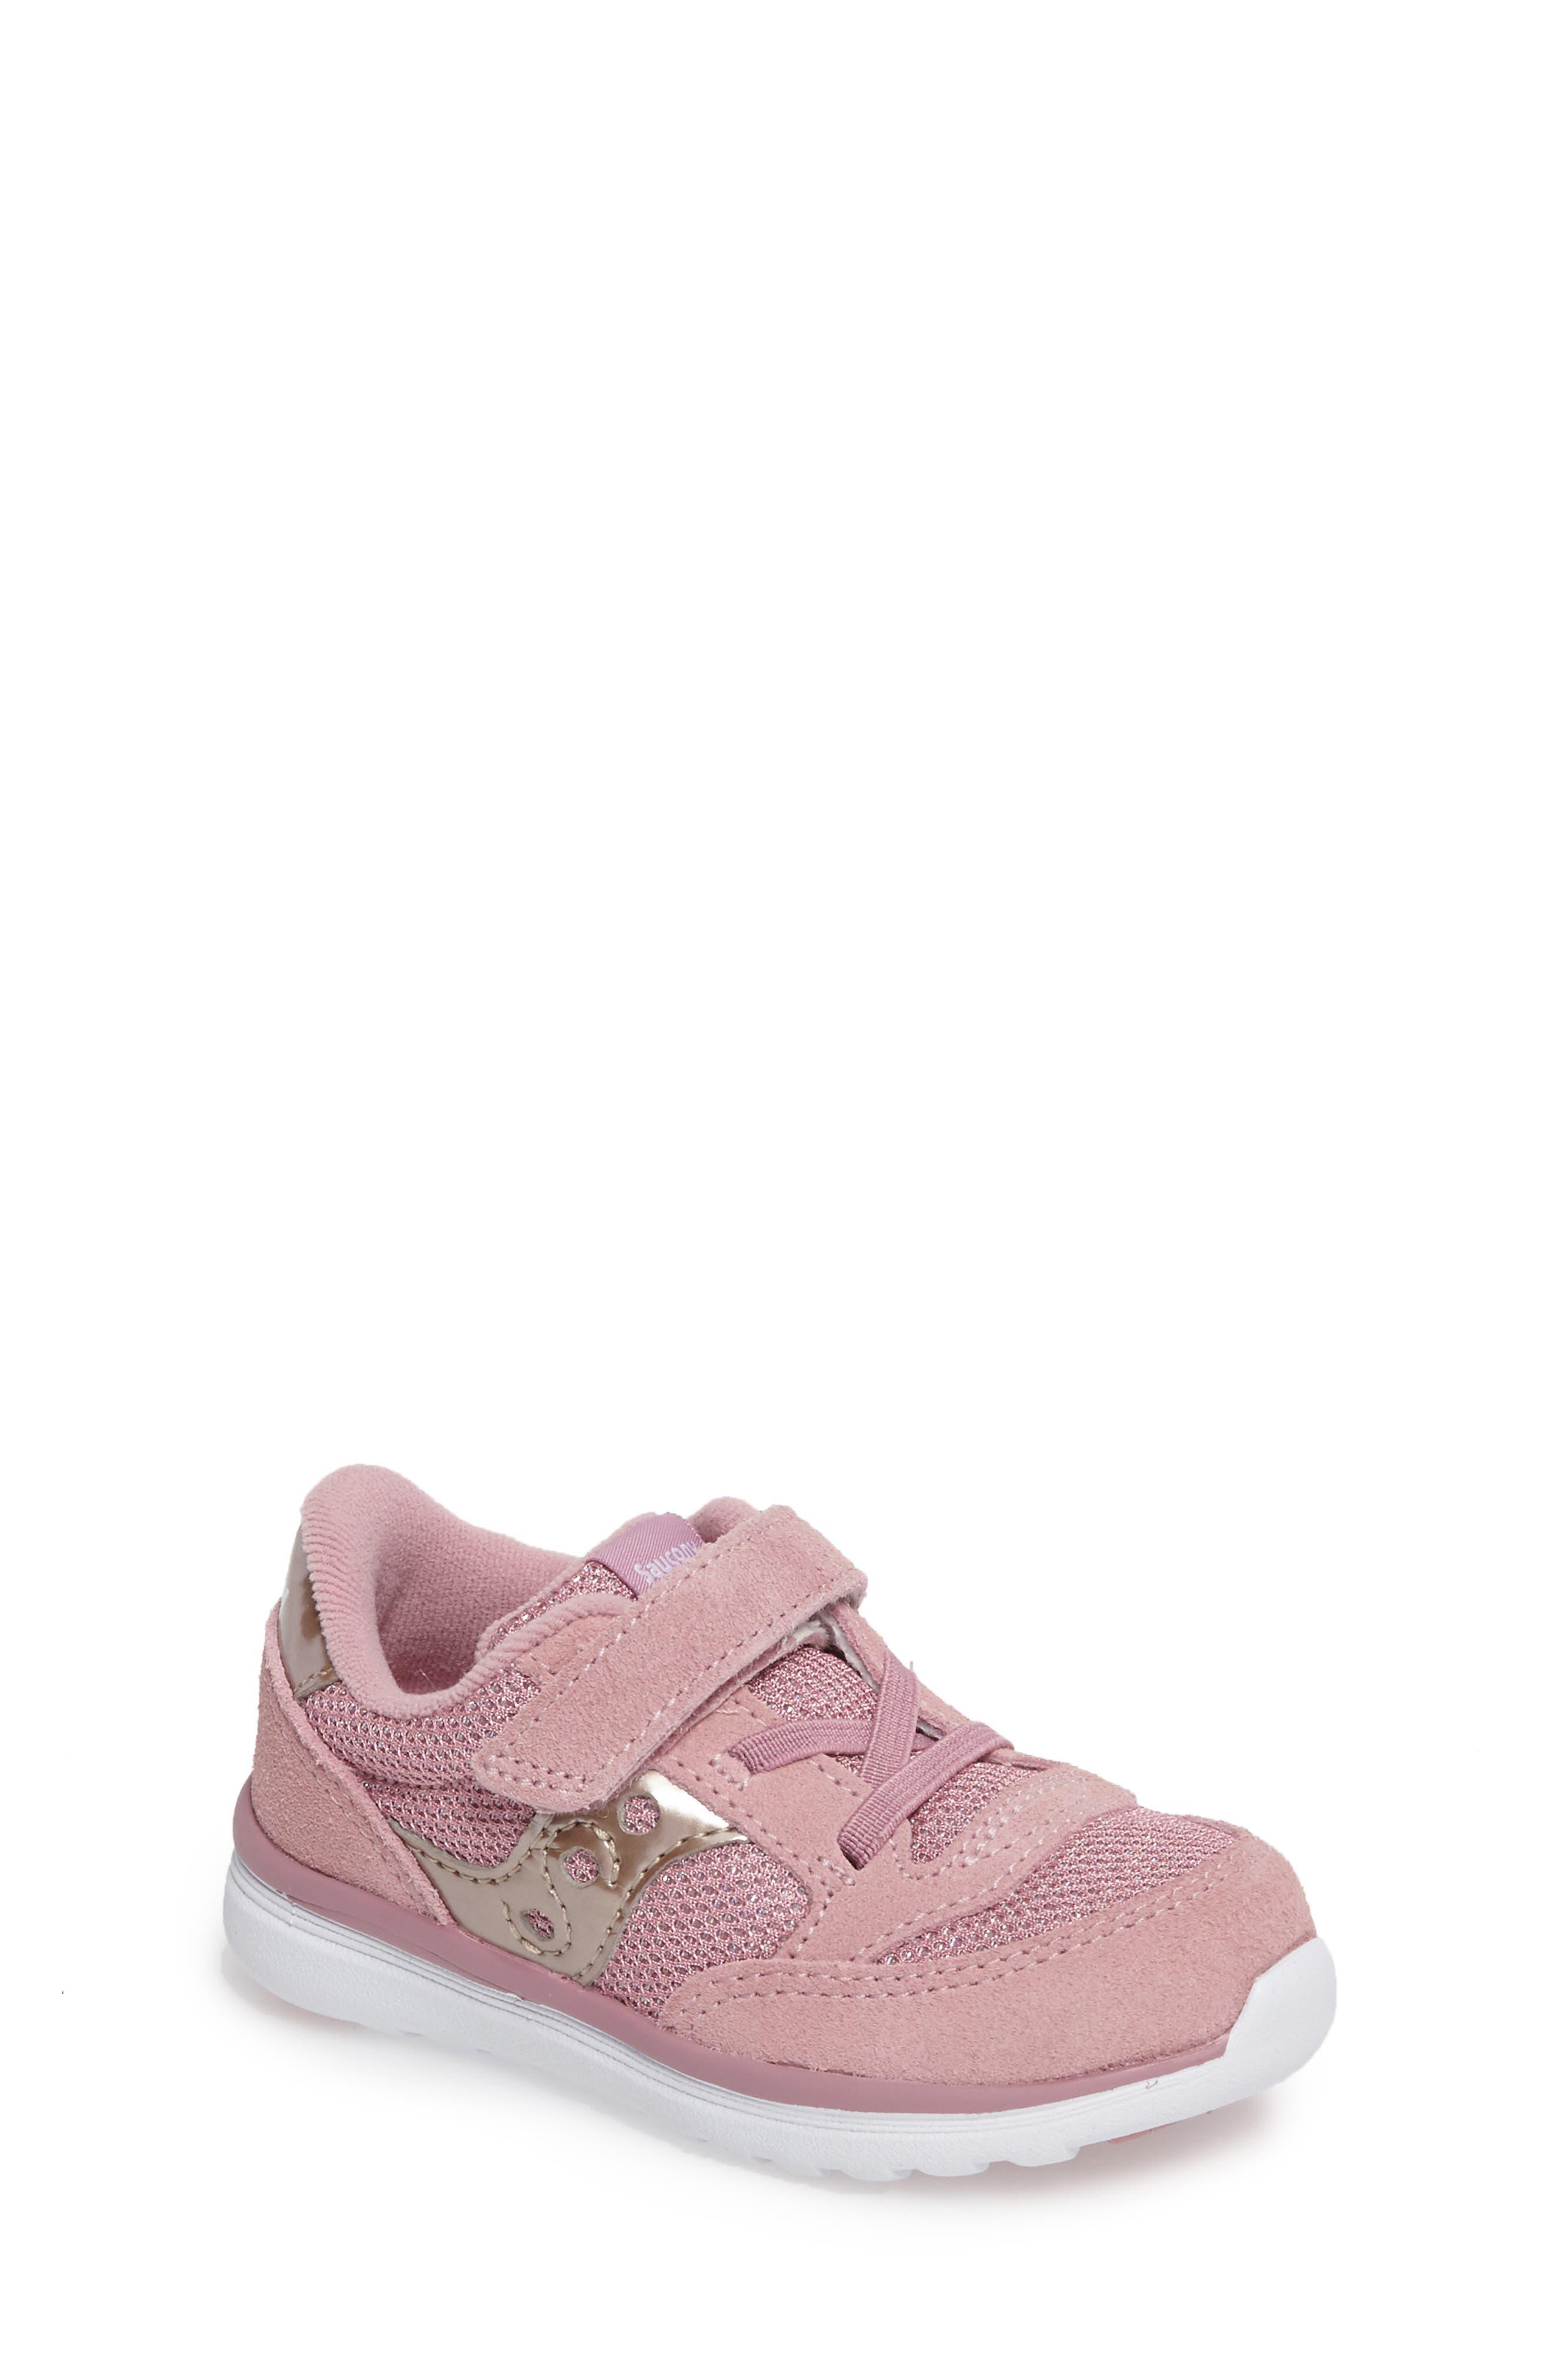 Jazz Lite Sneaker,                         Main,                         color, Blush Metallic